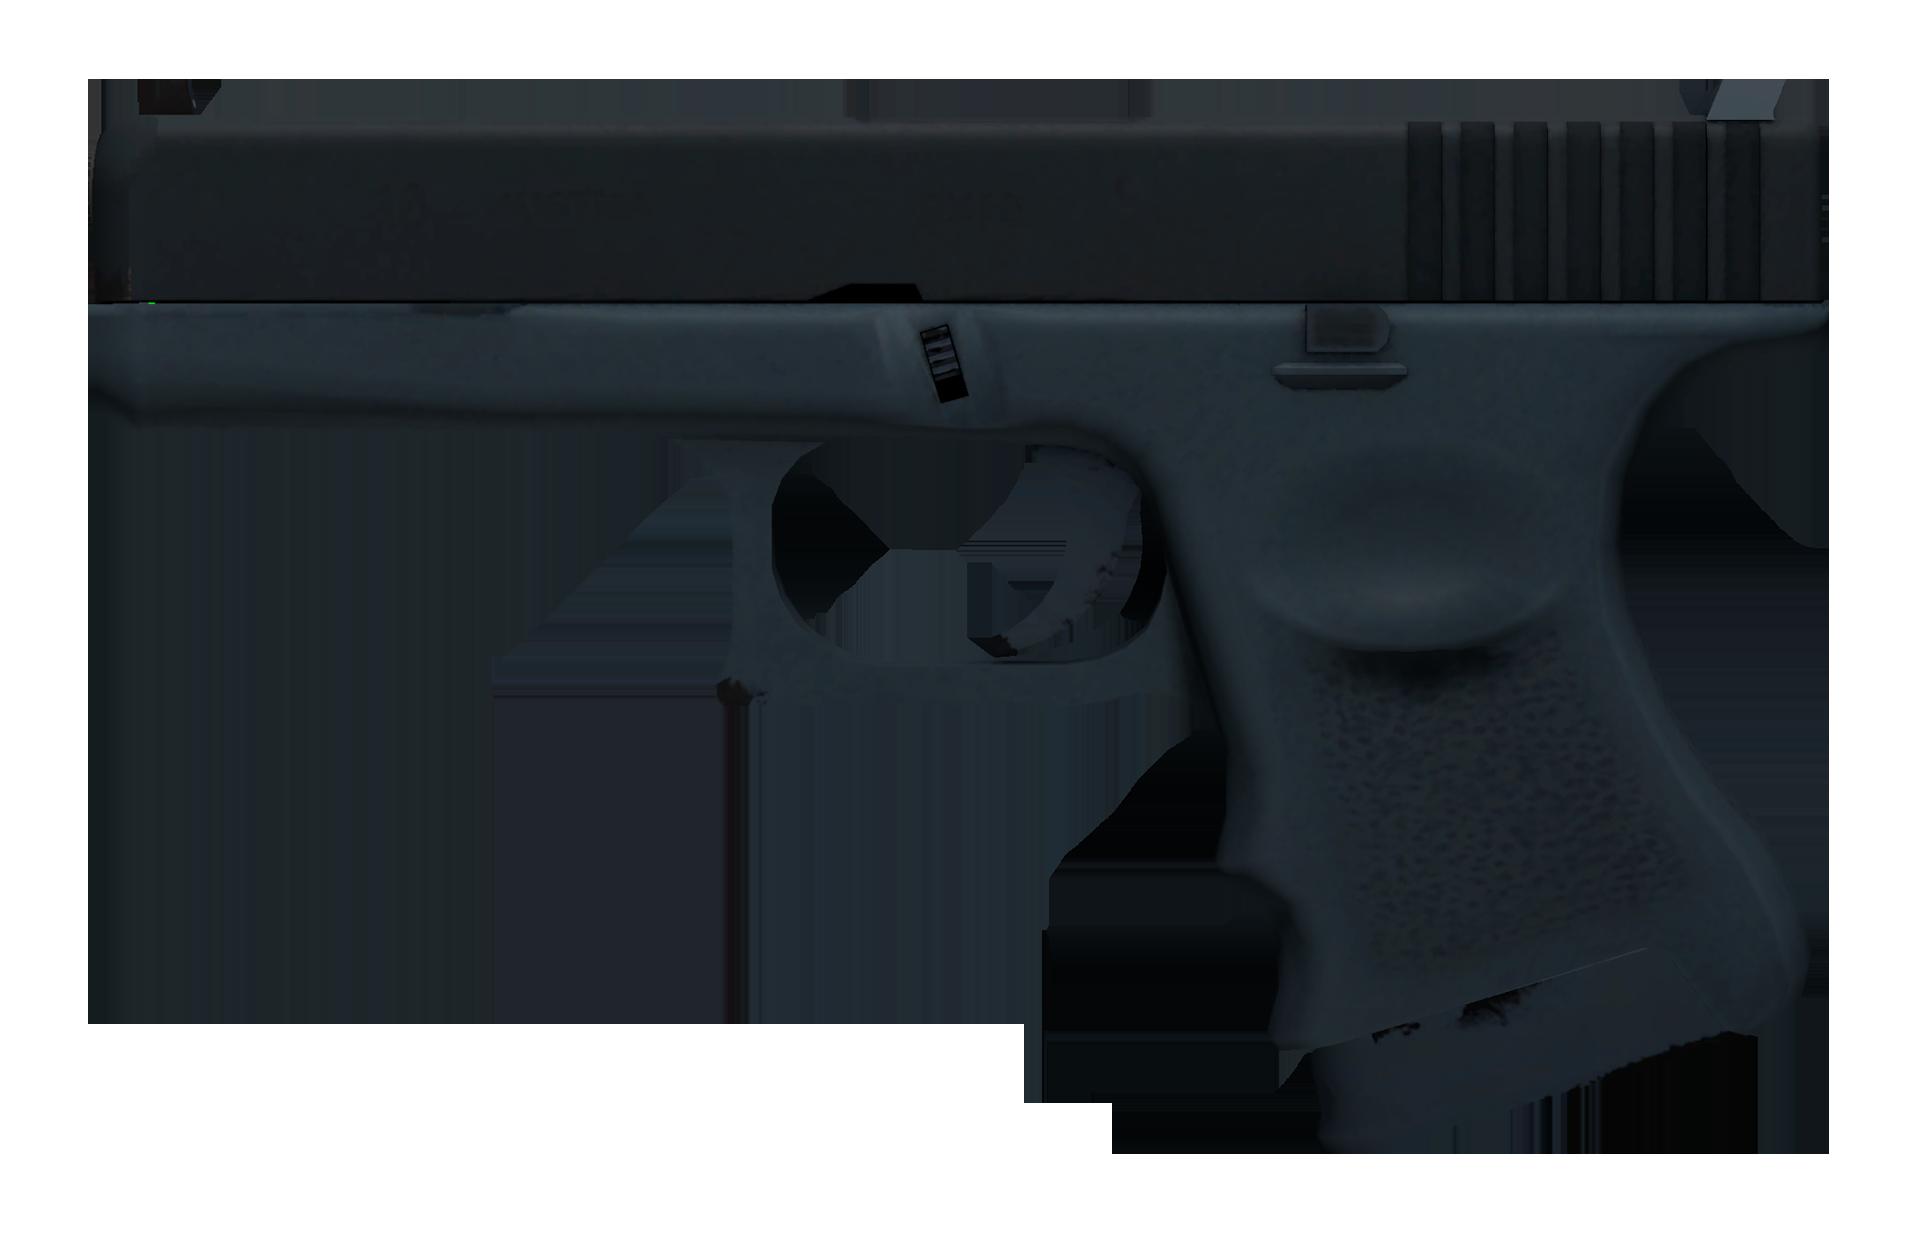 Glock-18 Night Large Rendering